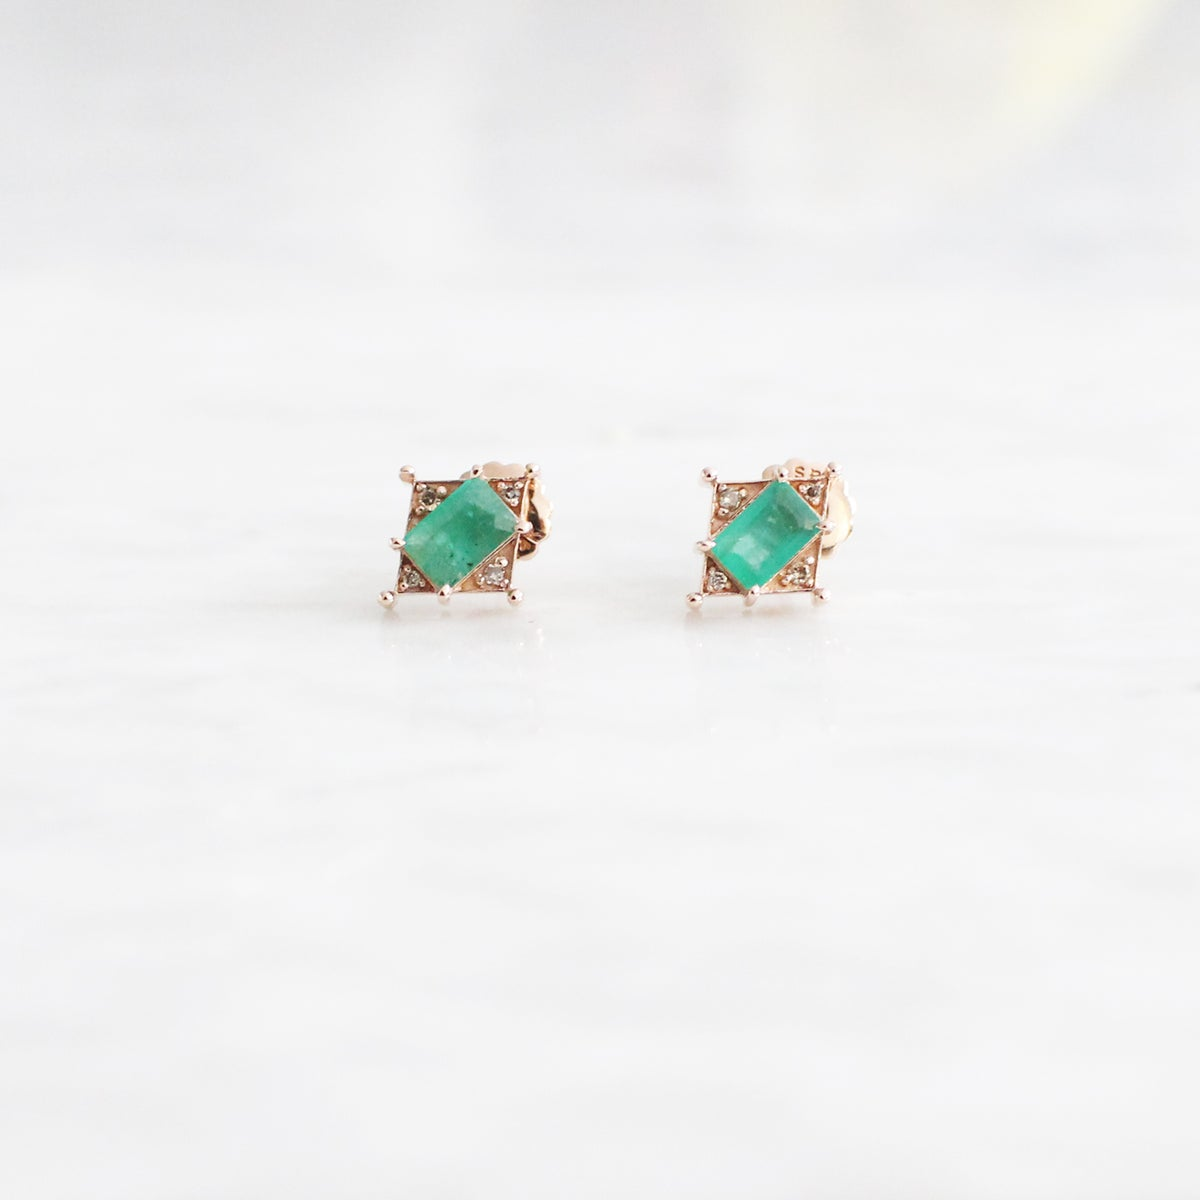 Image of Art Deco Emerald Earring